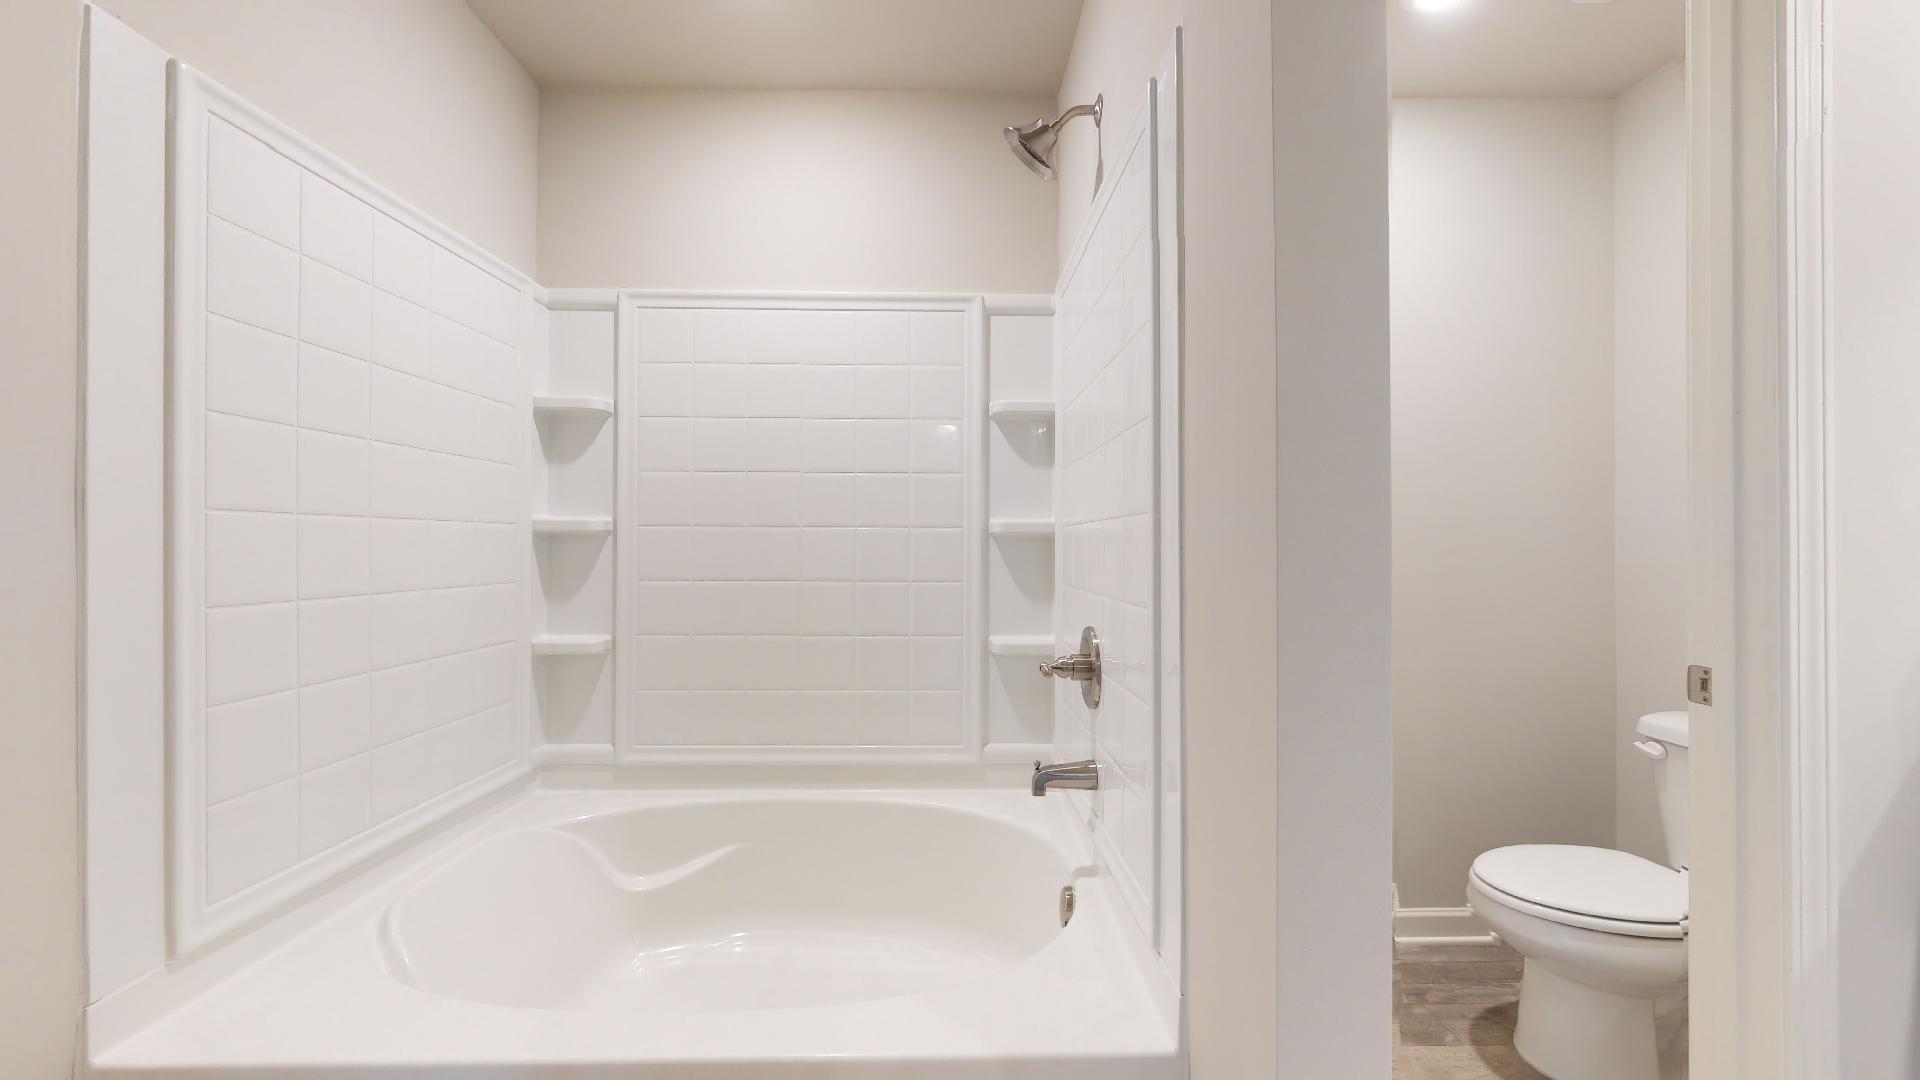 Bathroom featured in the Sierra By Liberty Communities in Atlanta, GA